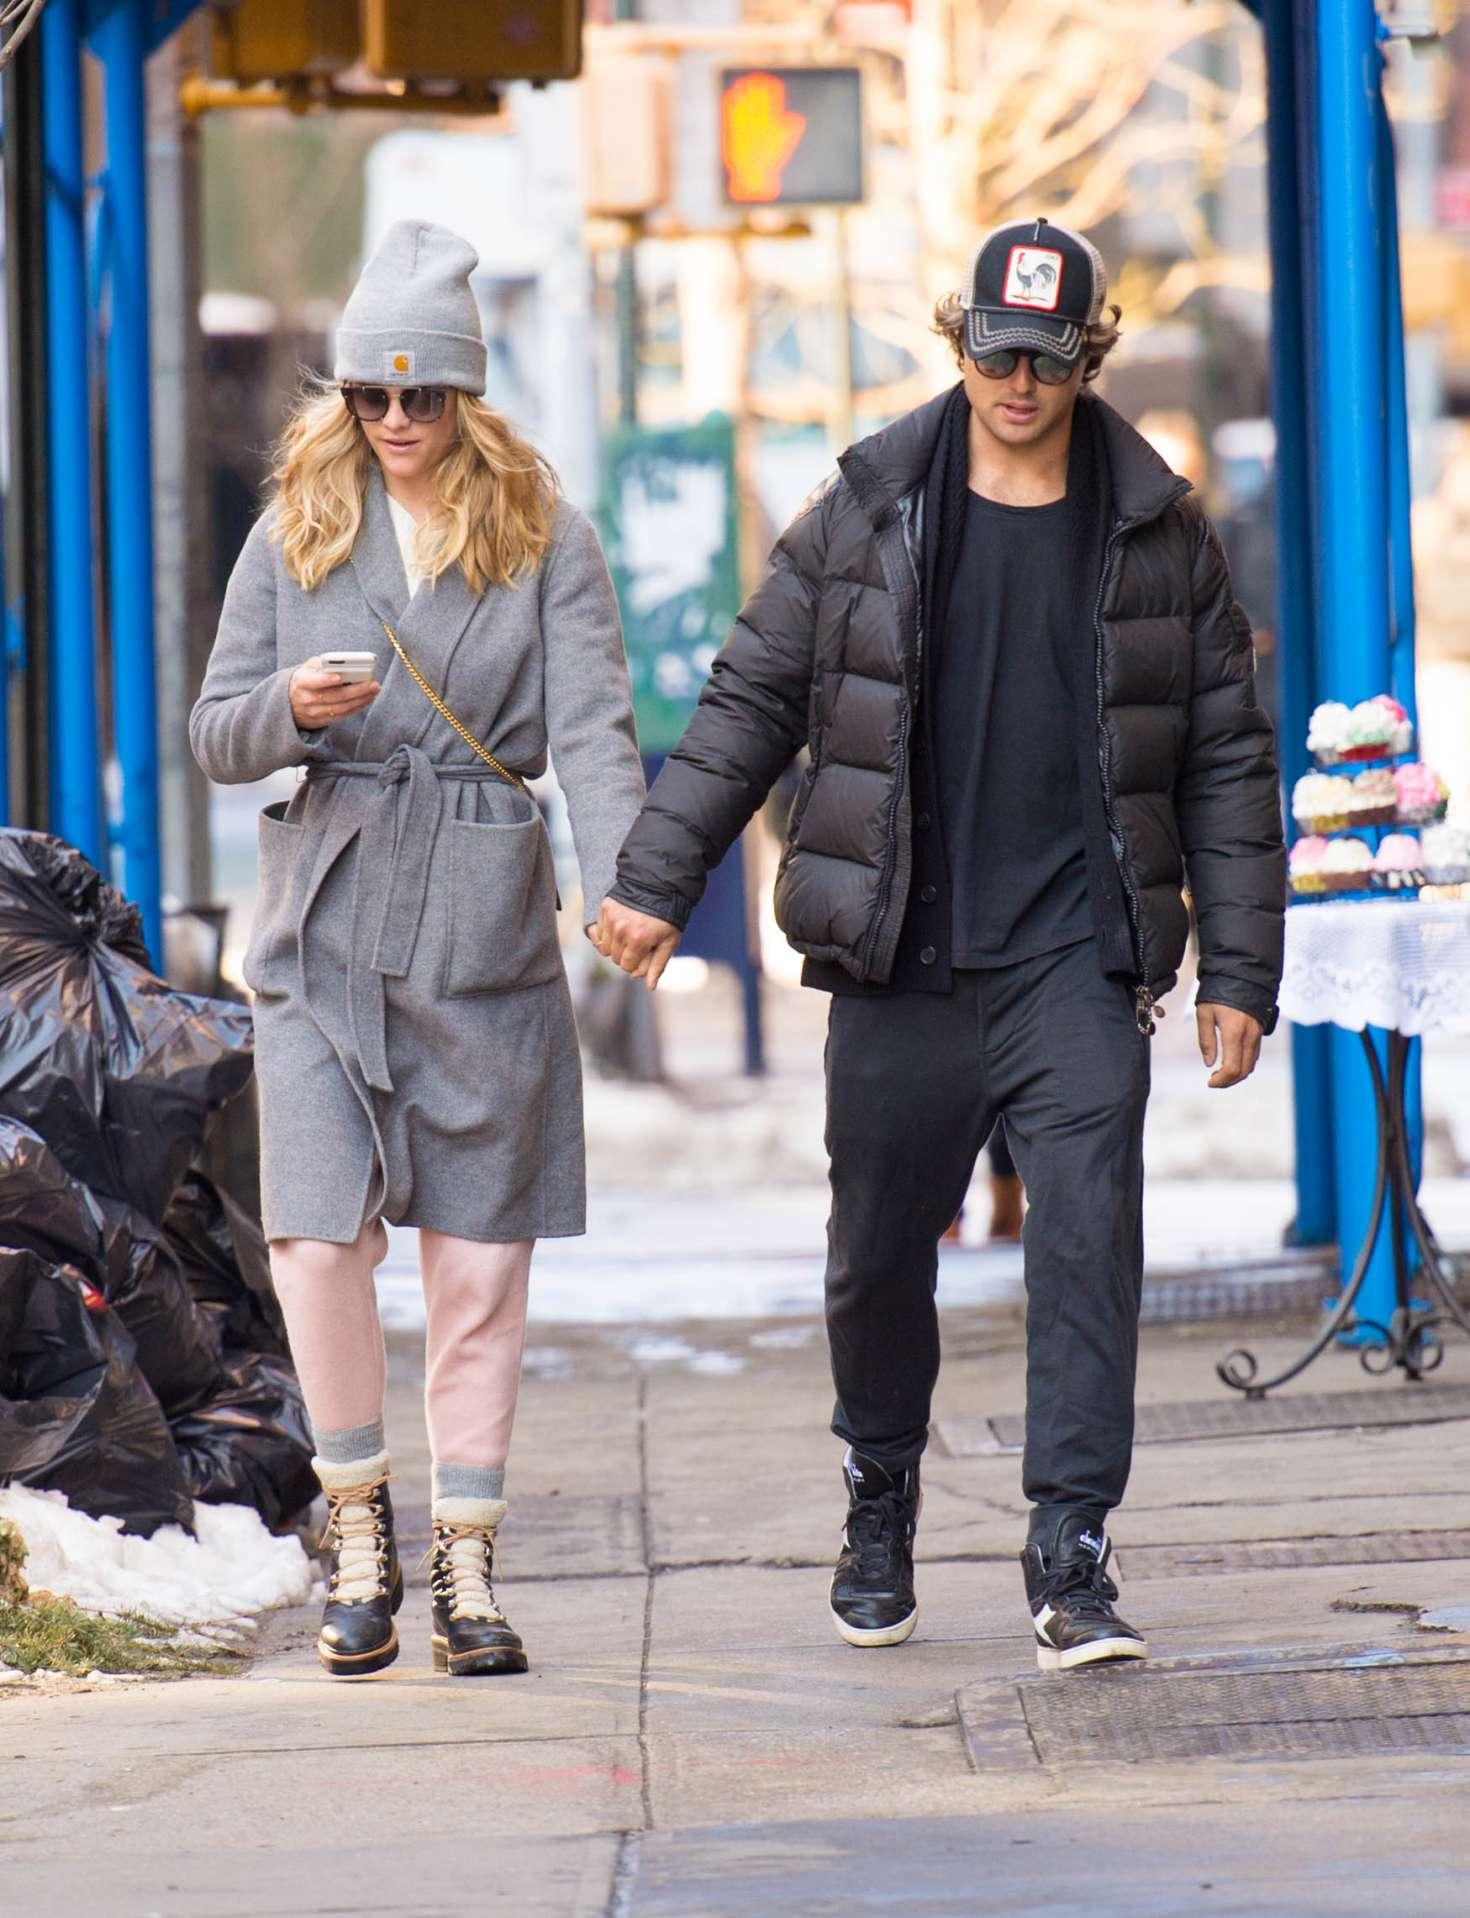 Nina Agdal 2018 : Nina Agdal: Shopping with boyfriend Jack Brinkley-Cook -15